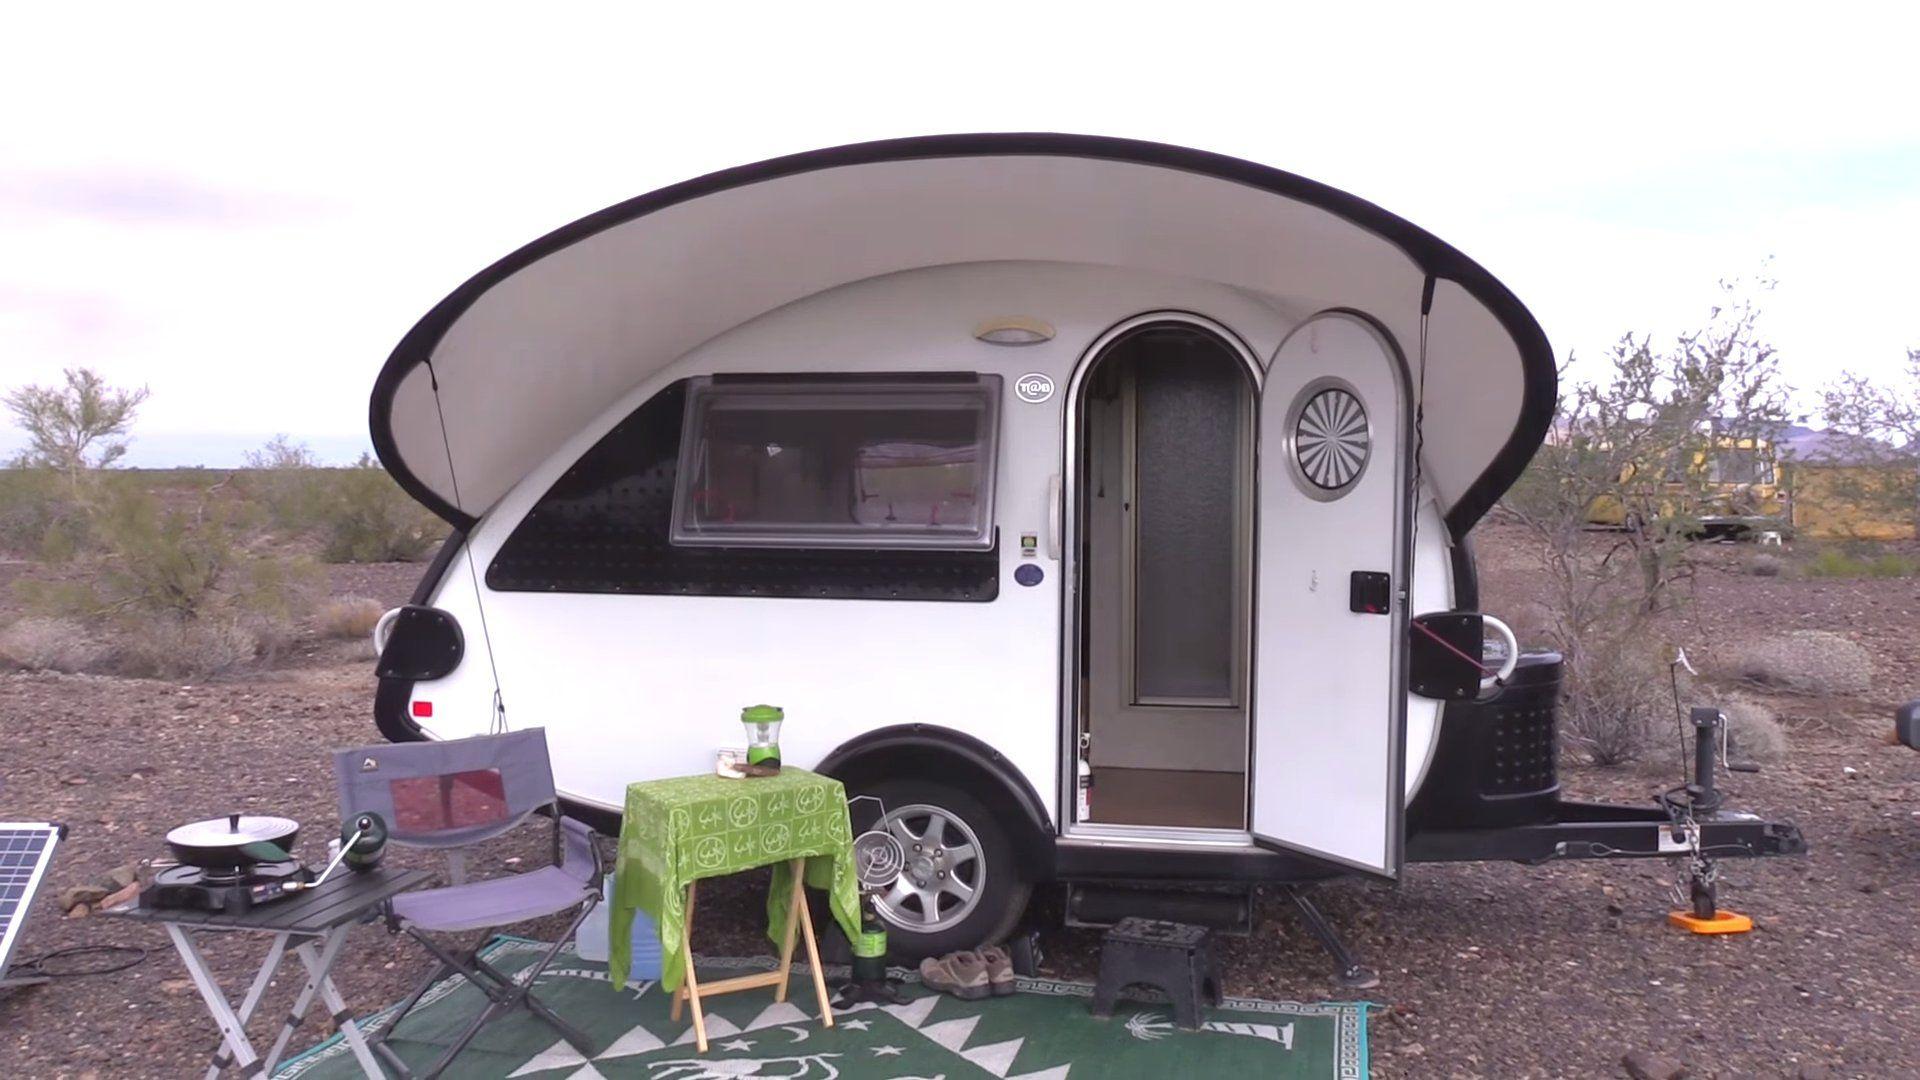 Medium Crop Of Beauer 3x Camper For Sale In Usa